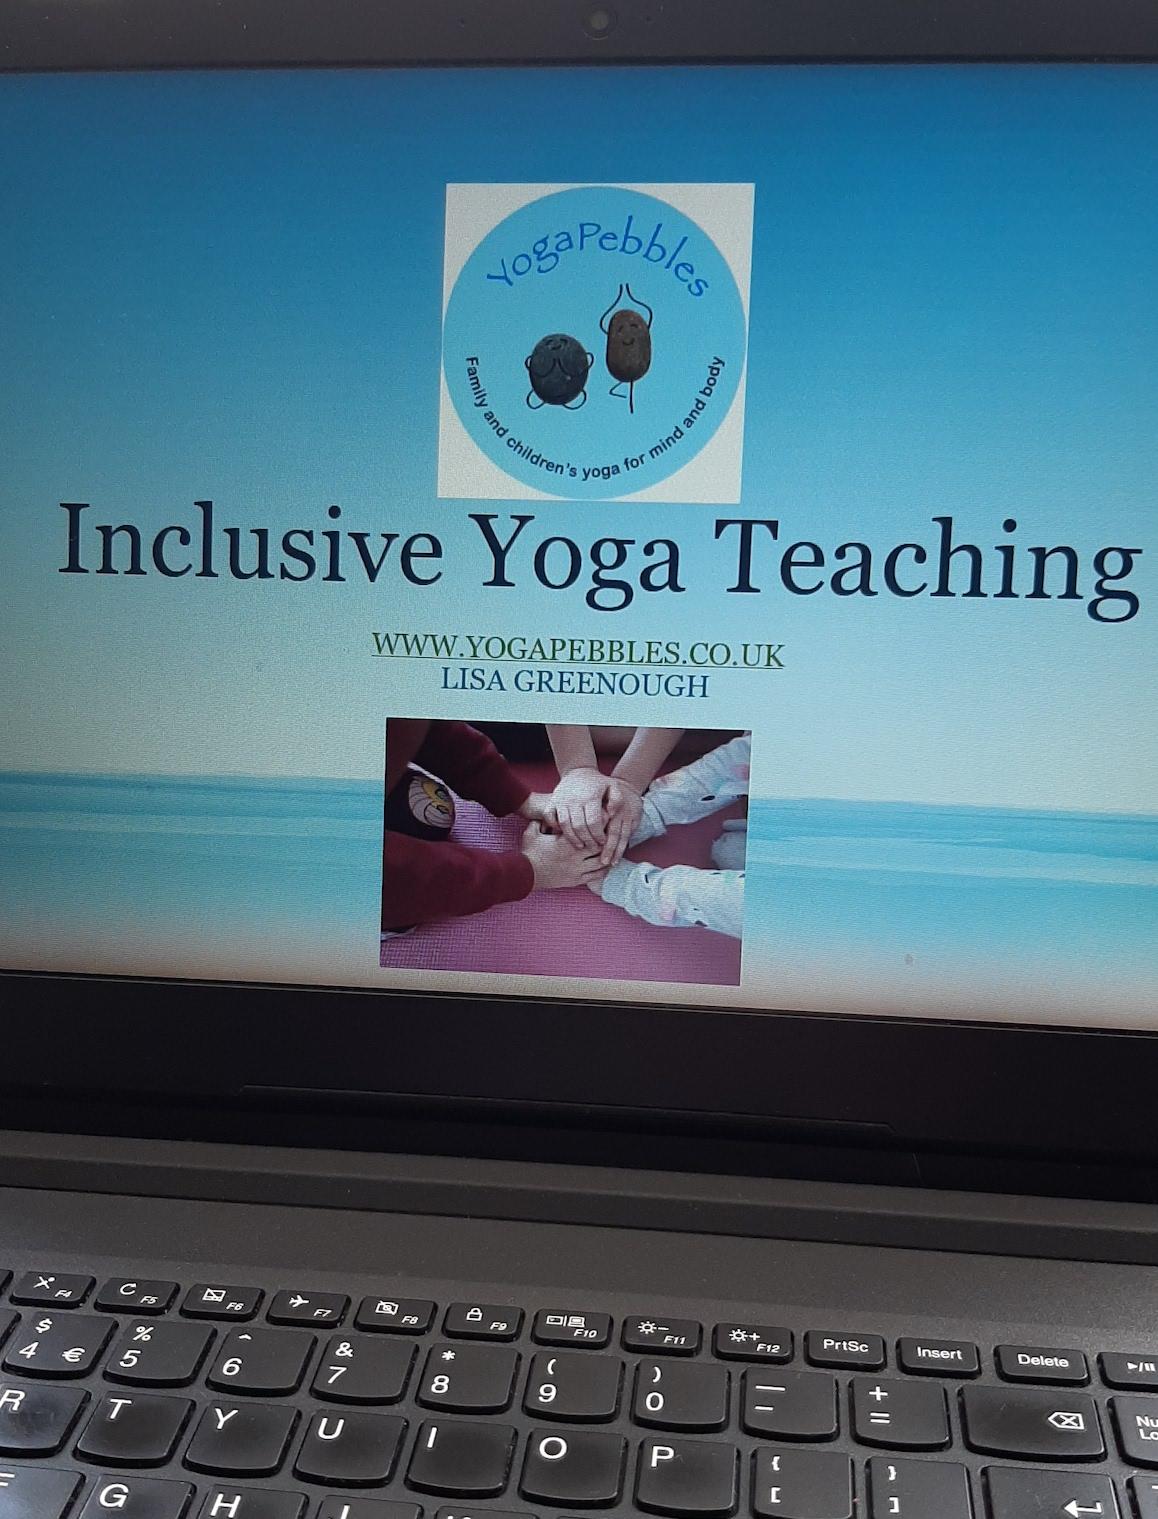 YogaPebbles inclusive yoga